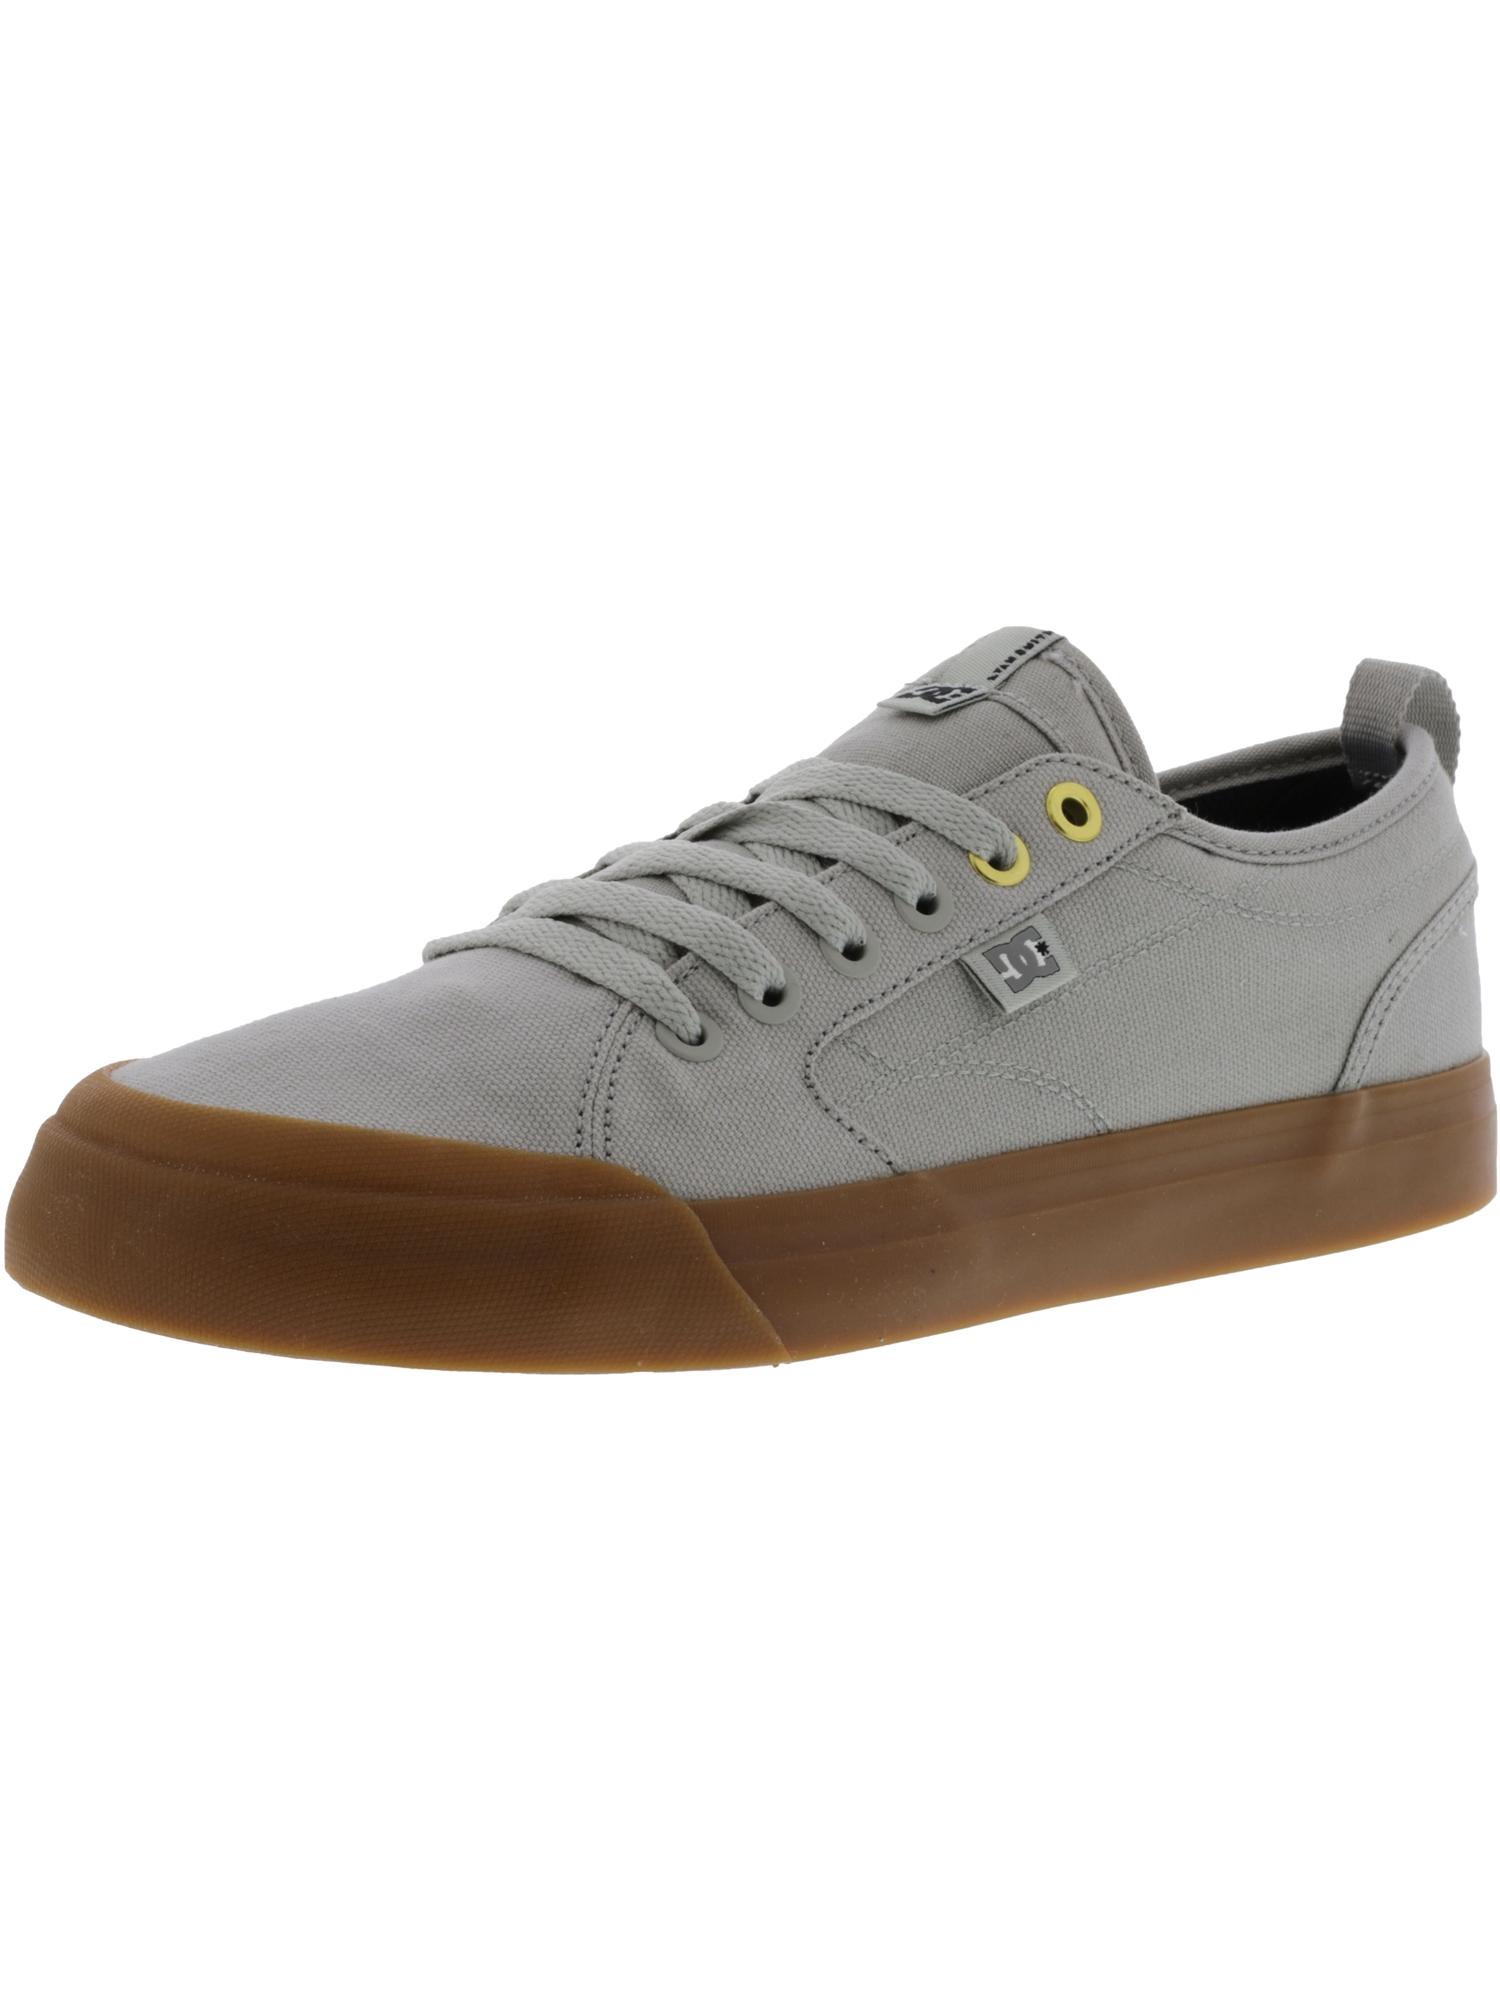 Dc Men's Evan Smith Tx Black / White Ankle-High Canvas Skateboarding Shoe - 12M